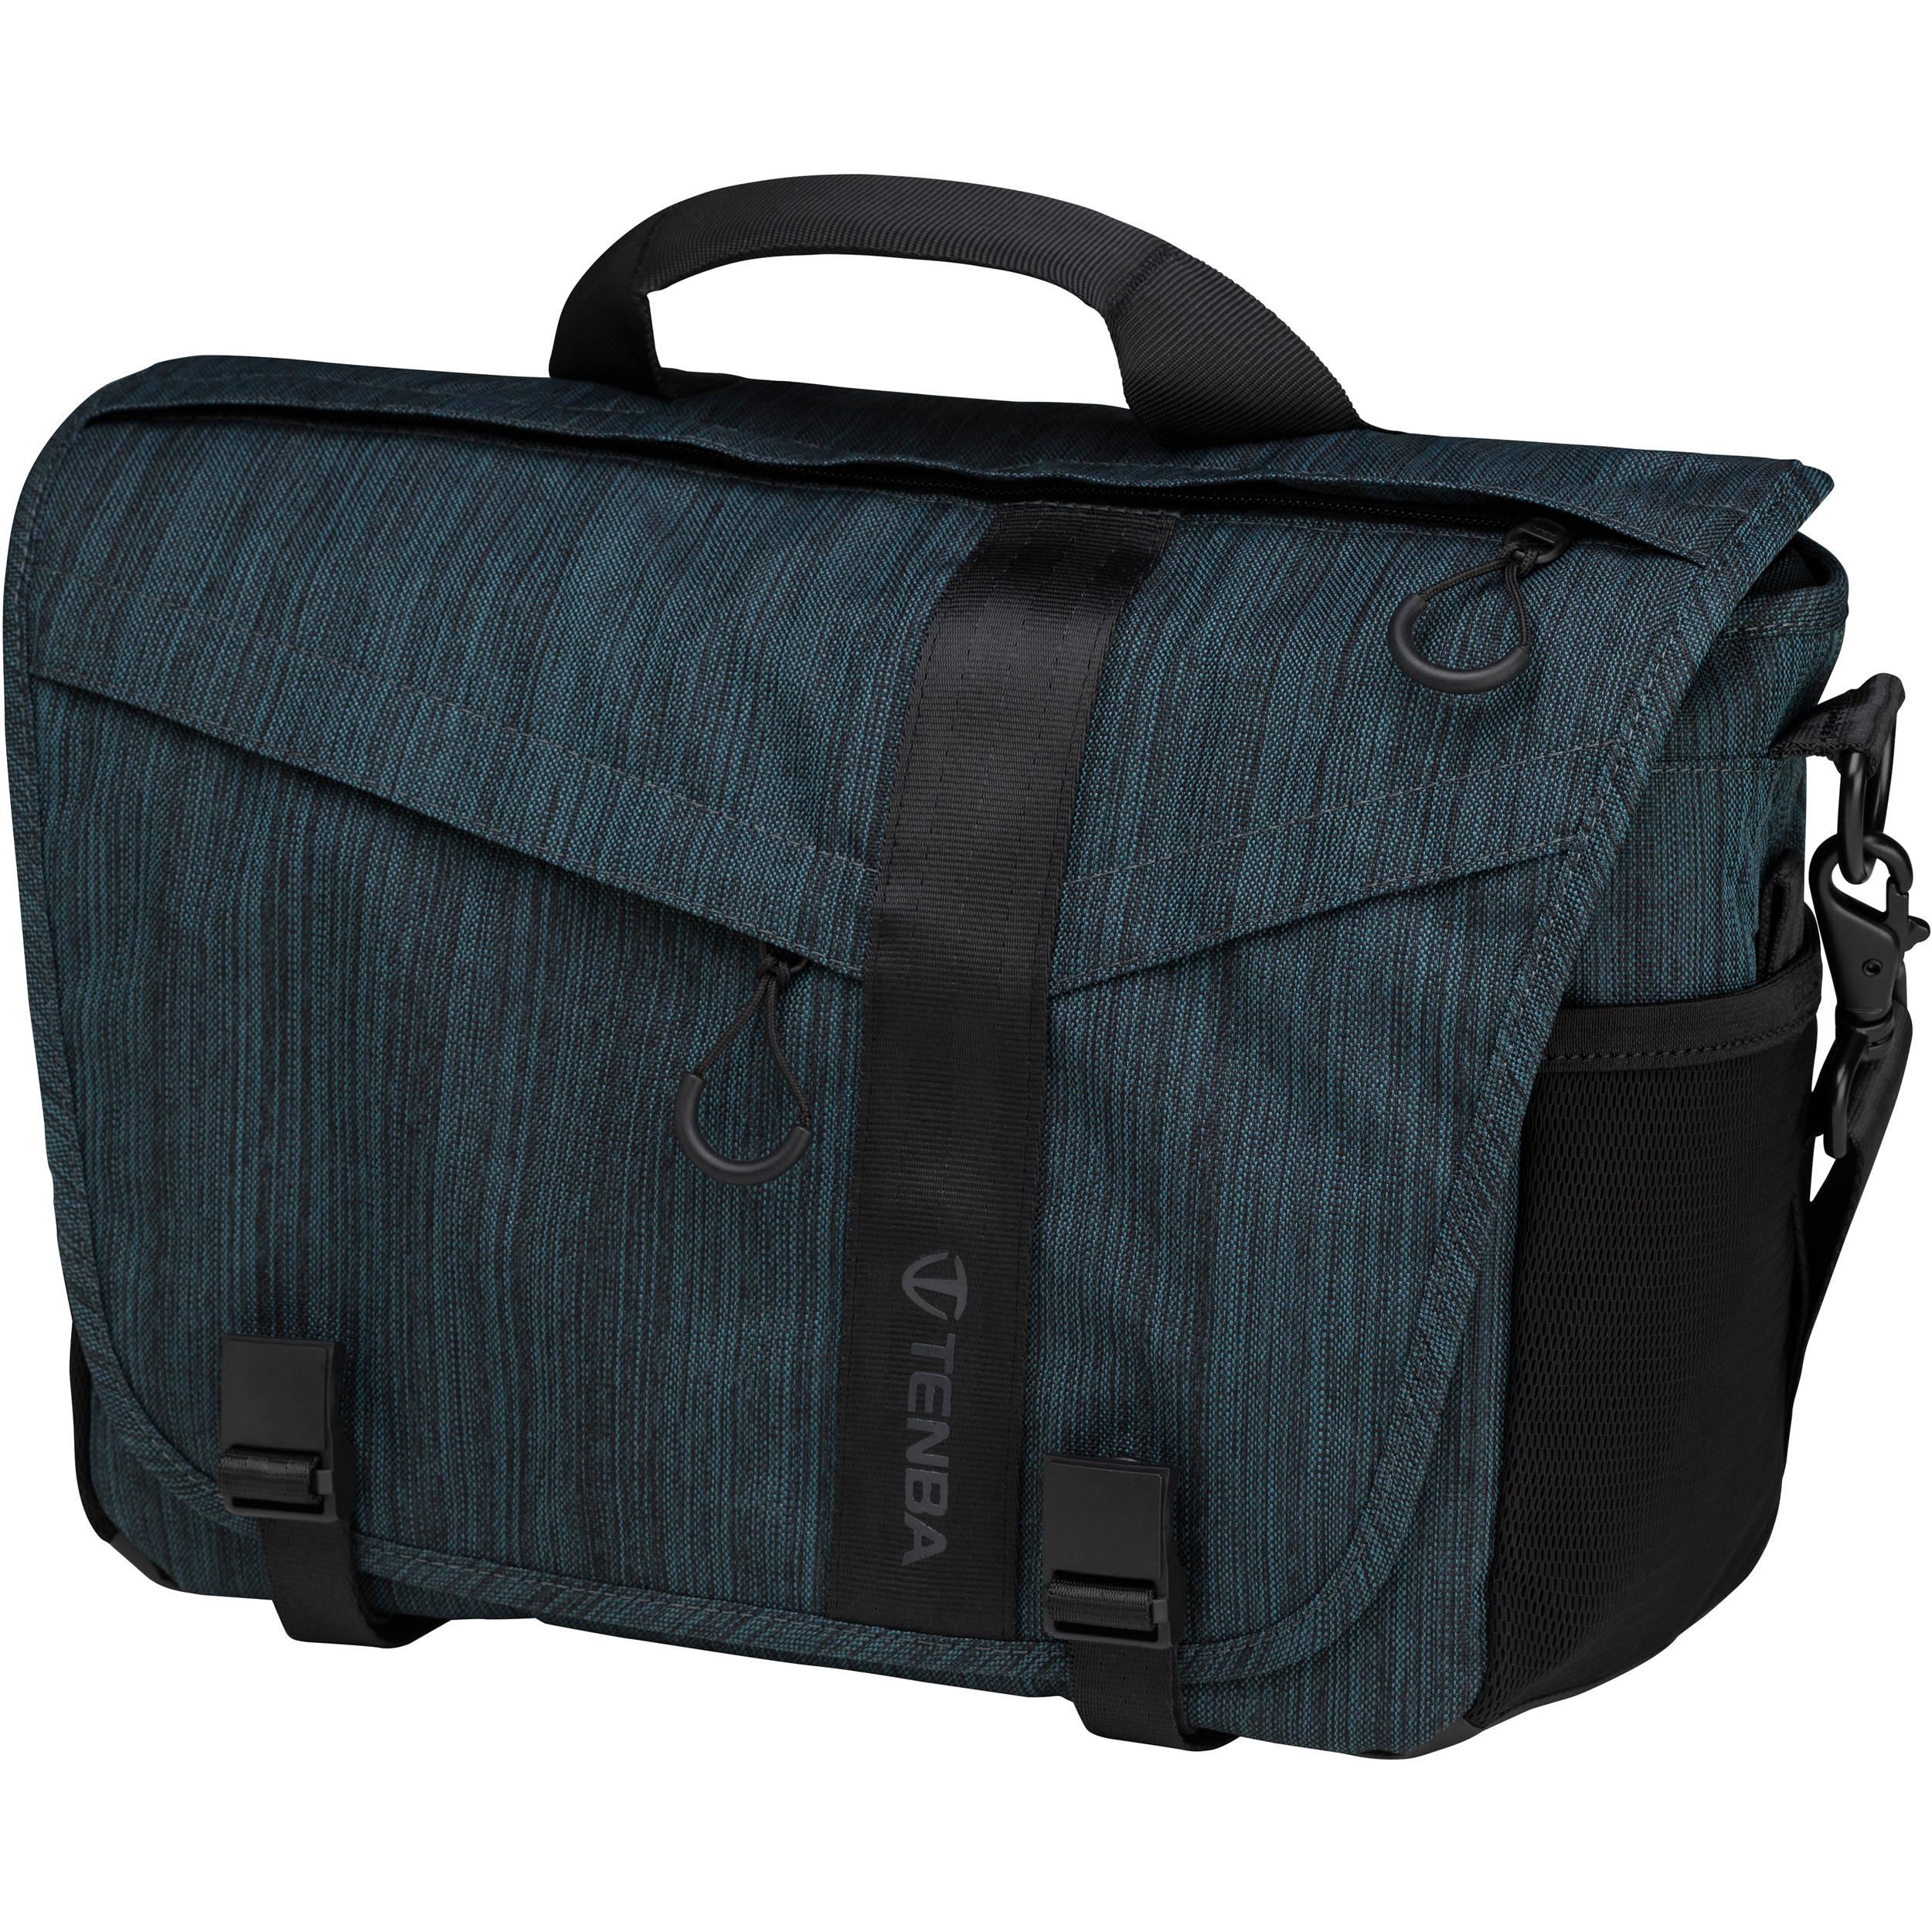 Tenba Dna 11 Messenger Bag Cobalt